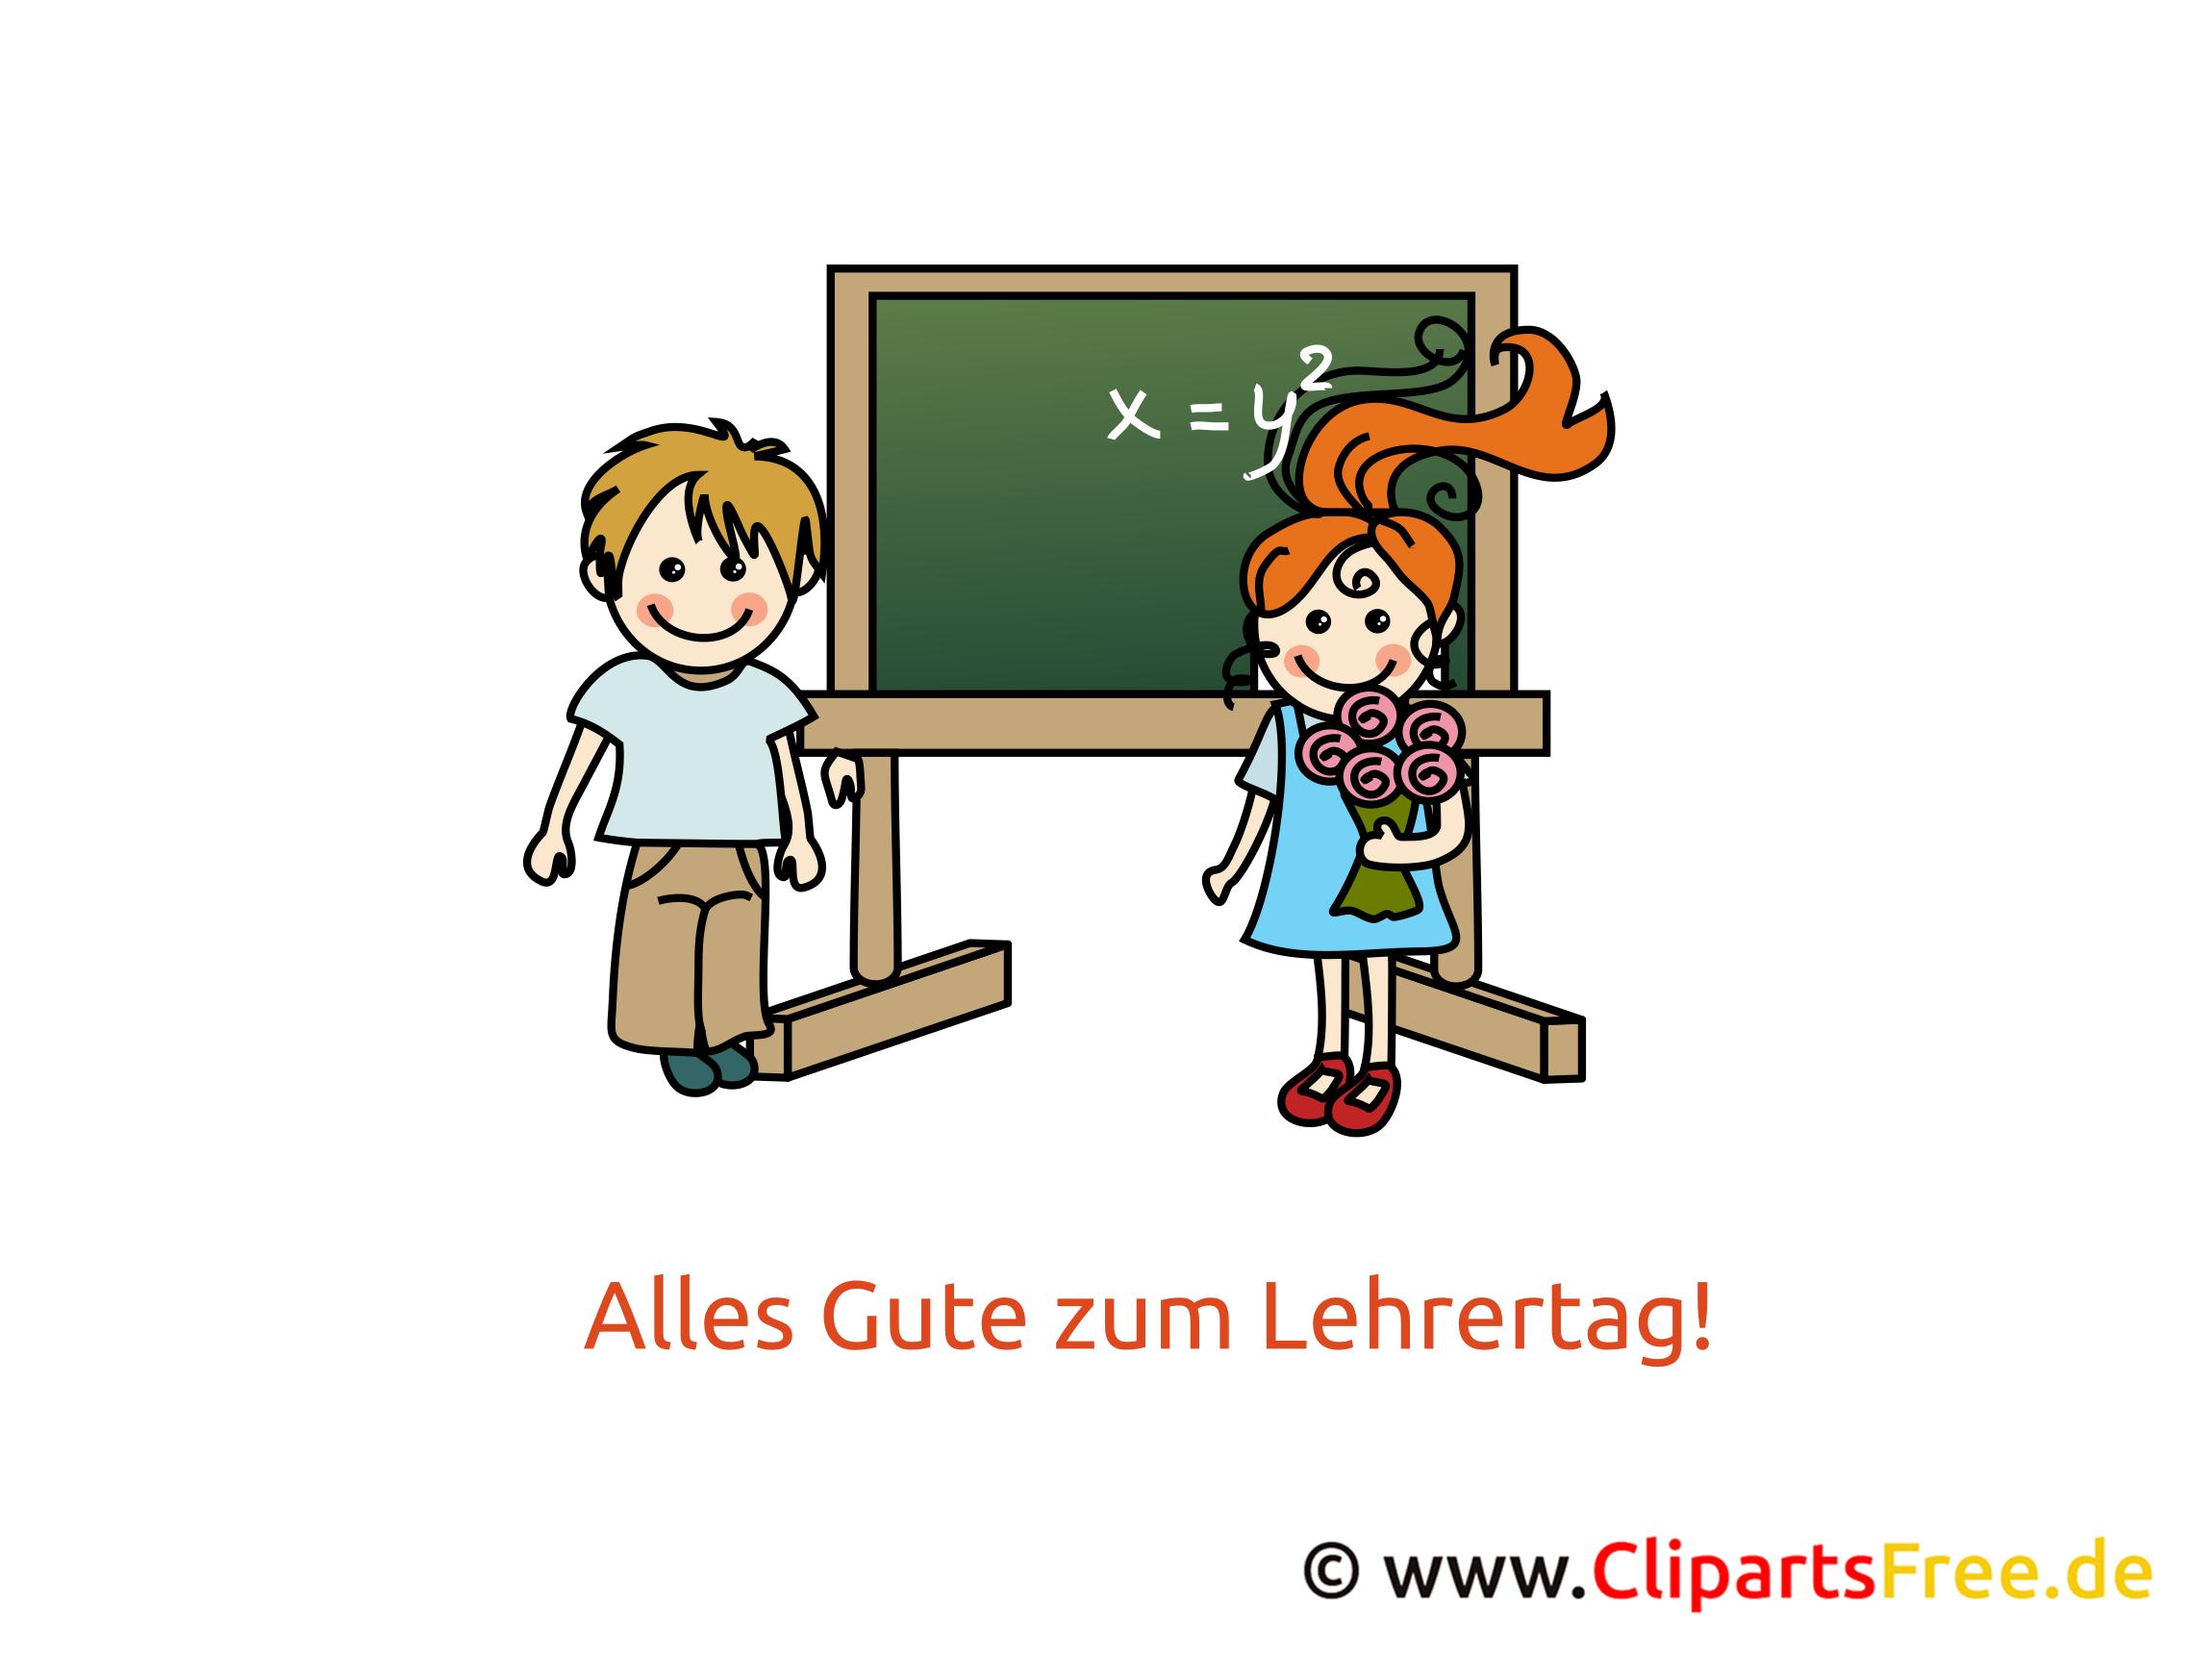 Lehrer Tag Clipart, Bild, Karte, Glückwünsche